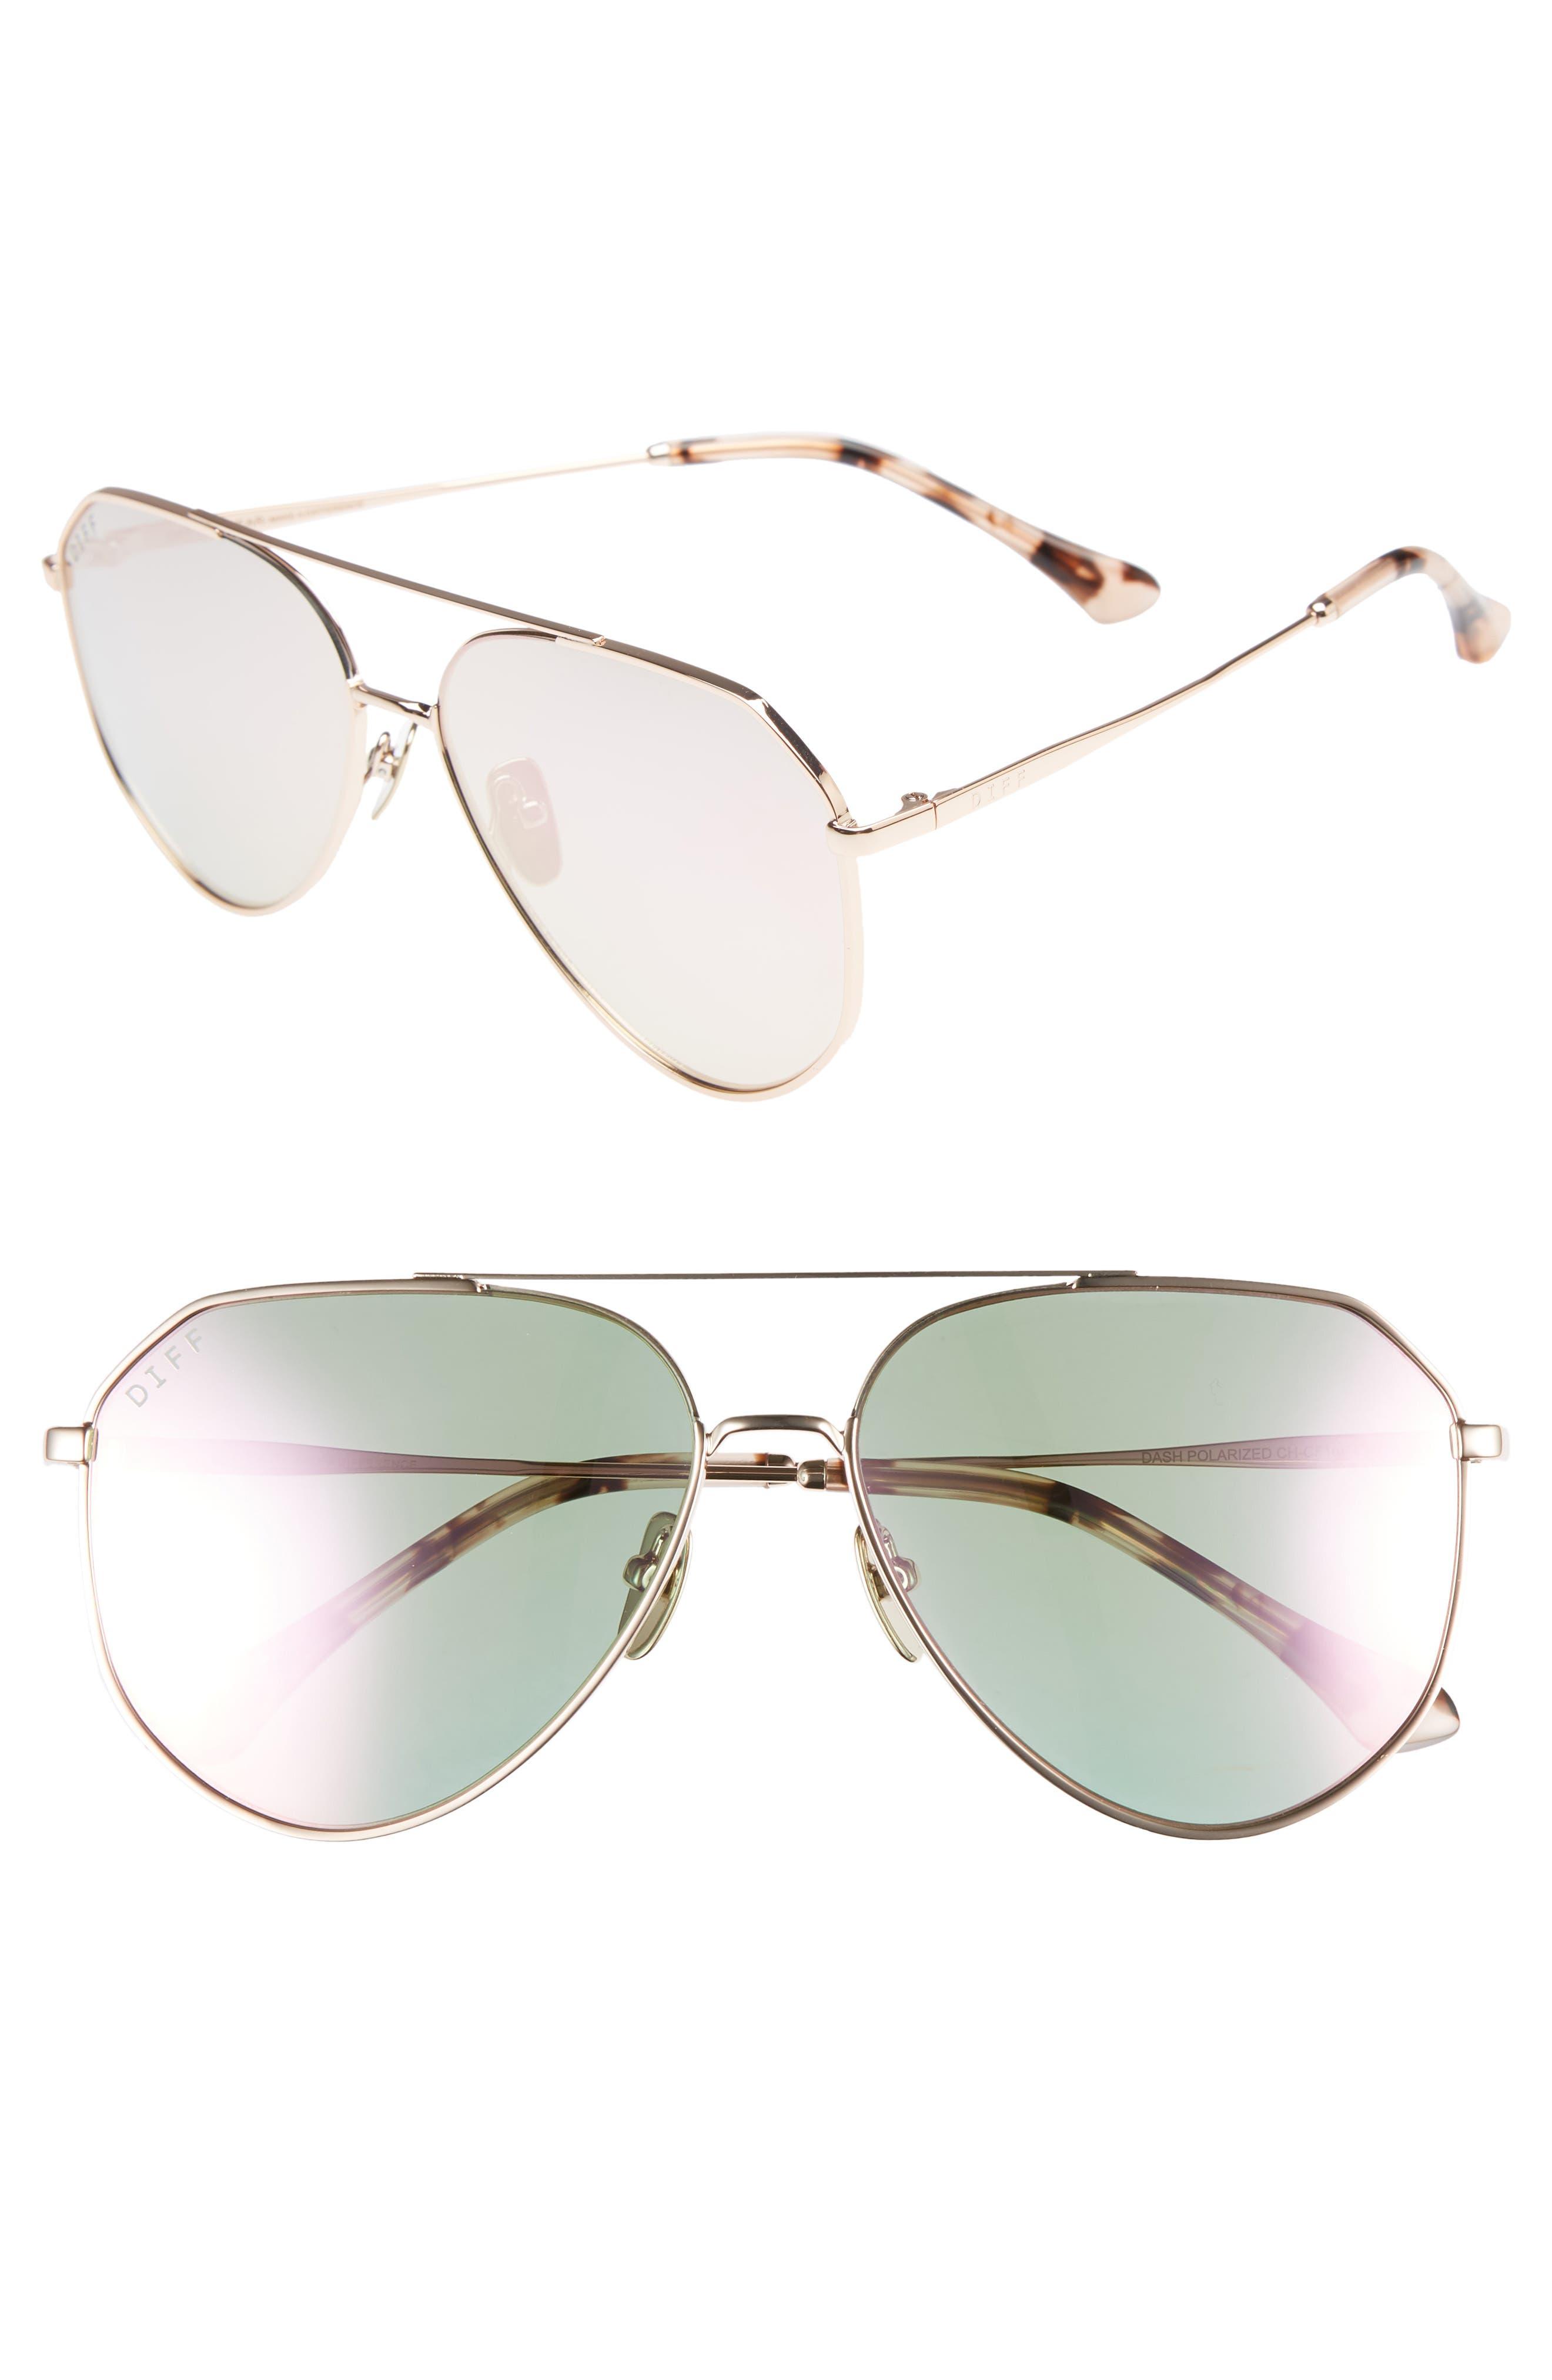 Dash 58mm Aviator Sunglasses,                             Main thumbnail 1, color,                             CHAMPAGNE